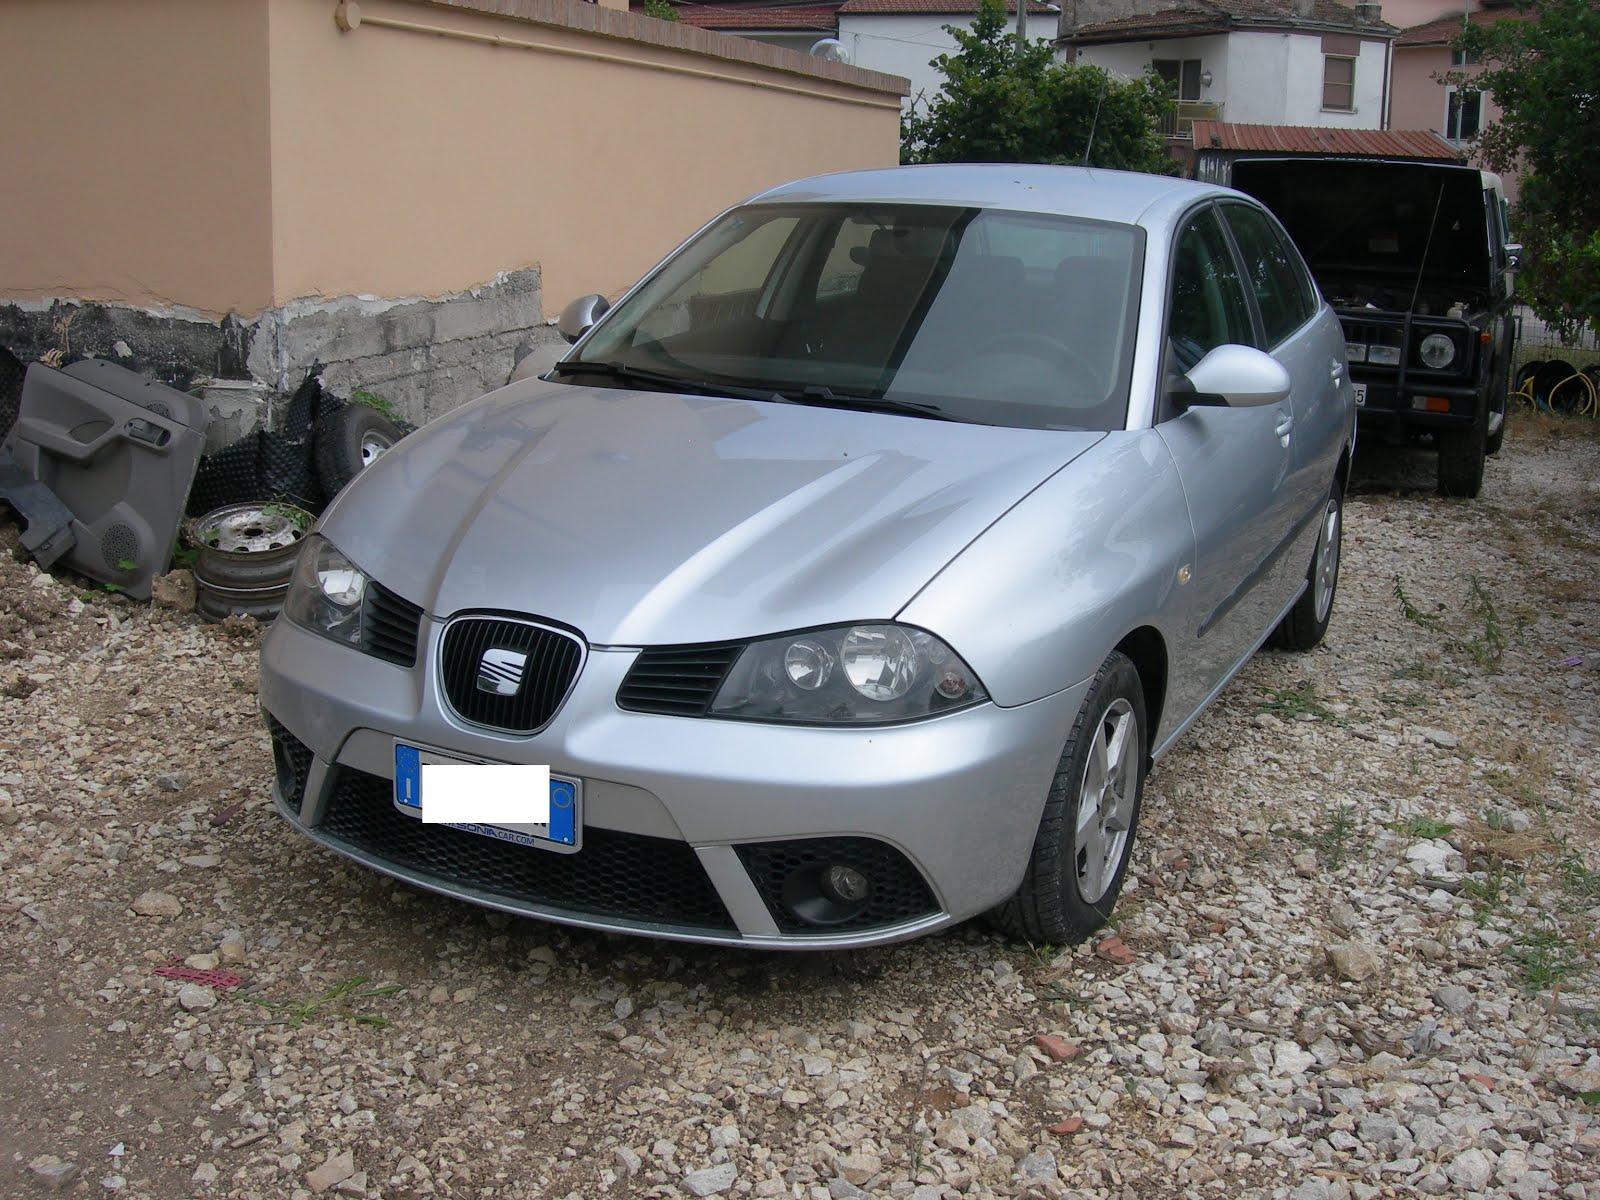 Seat Ibiza 1.4 TDI 75 CV acc.full optional 2007 cont.x prezzo